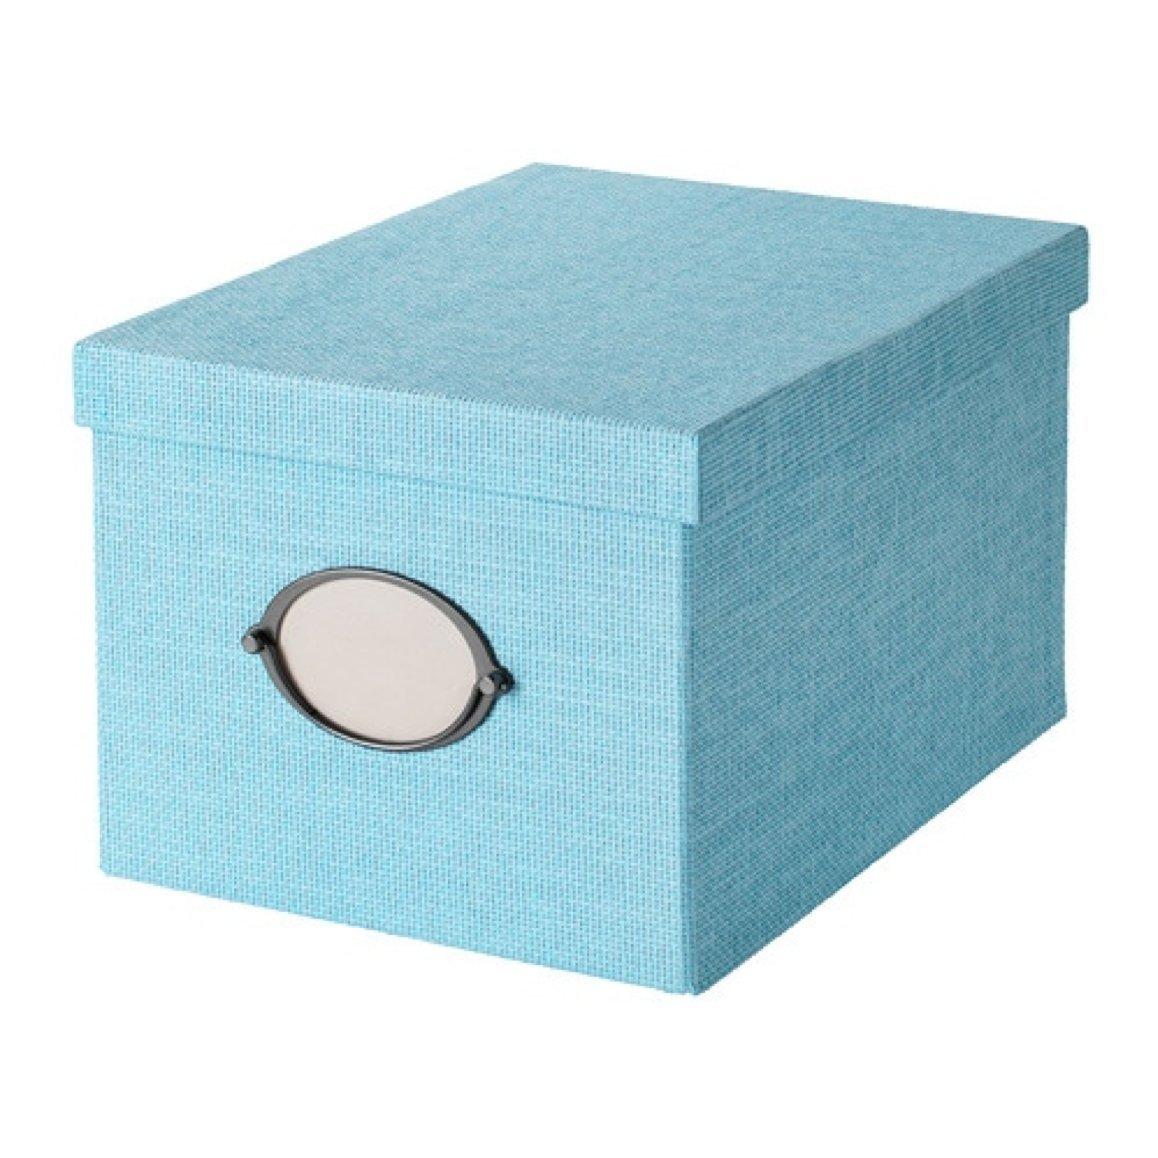 Ikea Kvarnvik 903.970.63 - Caja de almacenaje con tapa (tamaño 9, 4 x 13 x 7 cm), color azul: Amazon.es: Hogar